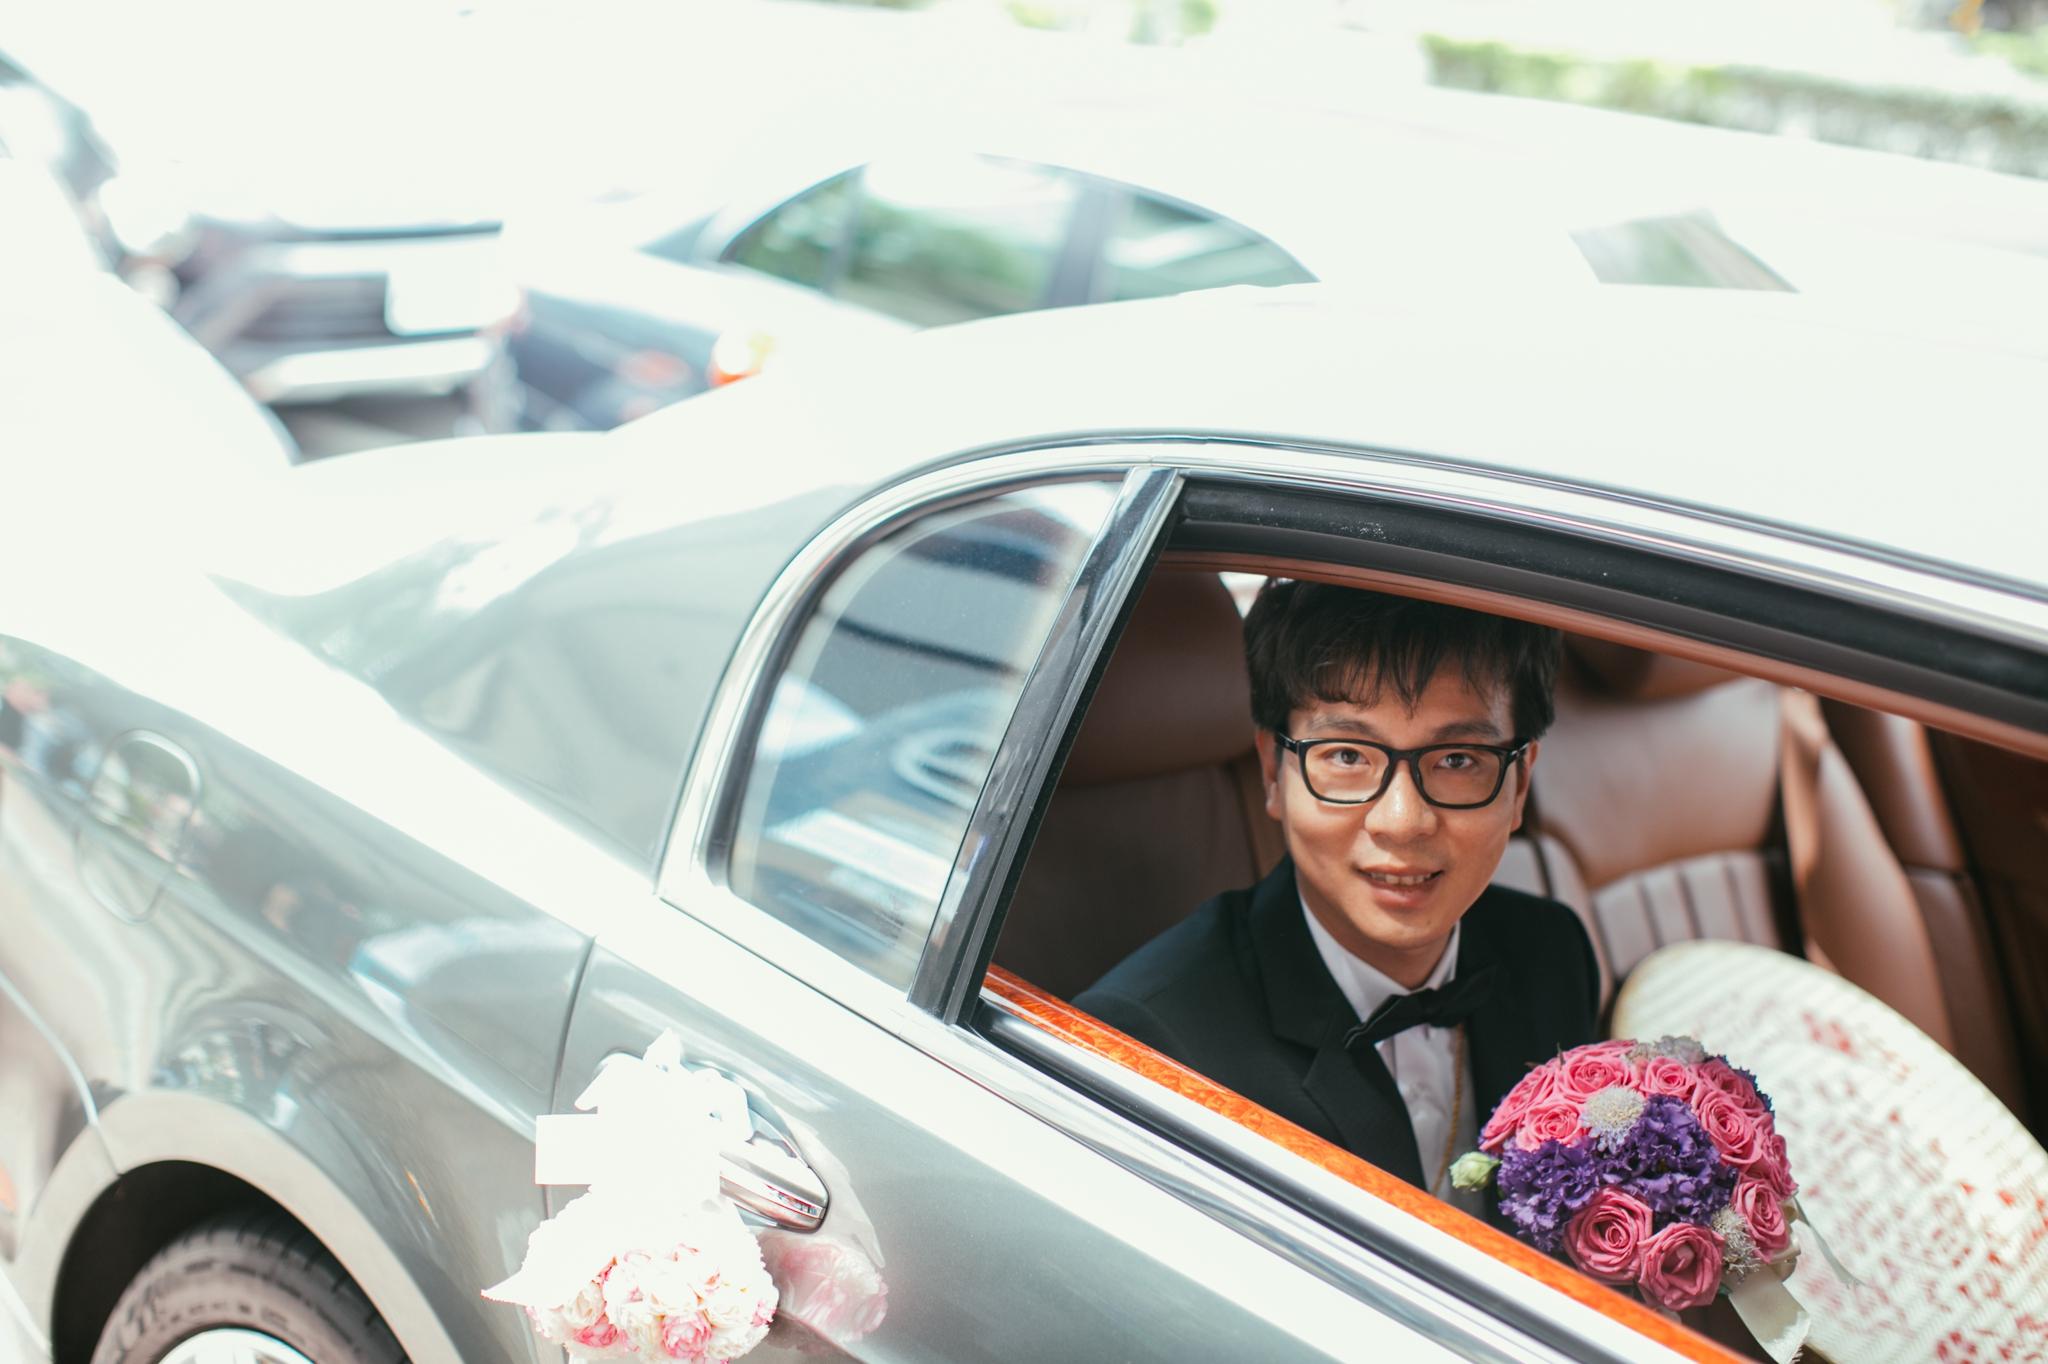 Tina+Nash-wedding-台北婚禮迎娶晚宴-新莊終身大事-021.jpg